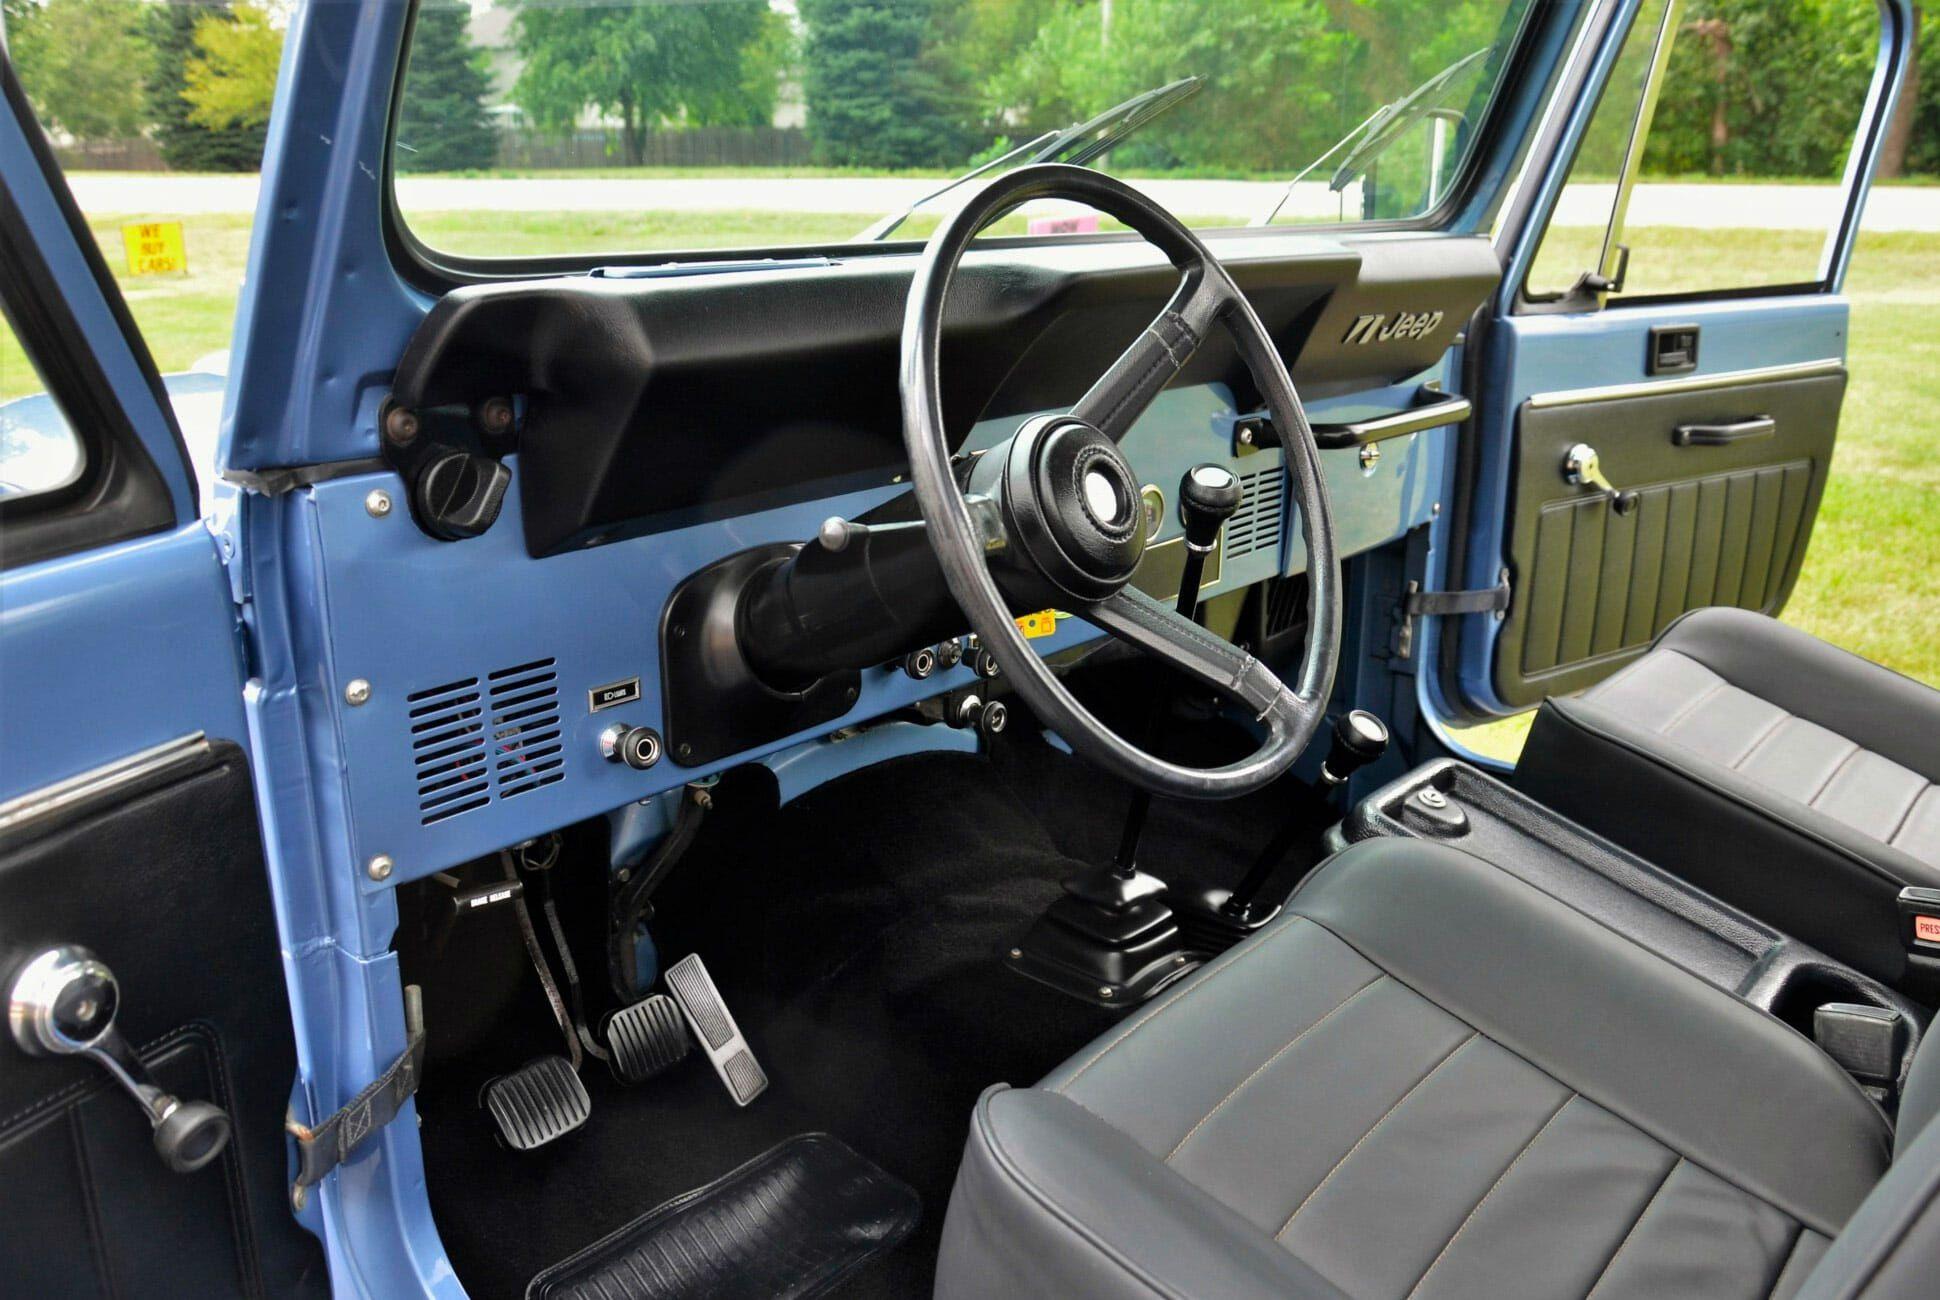 1984-Jeep-CJ8-Scrambler-gear-patrol-slide-7